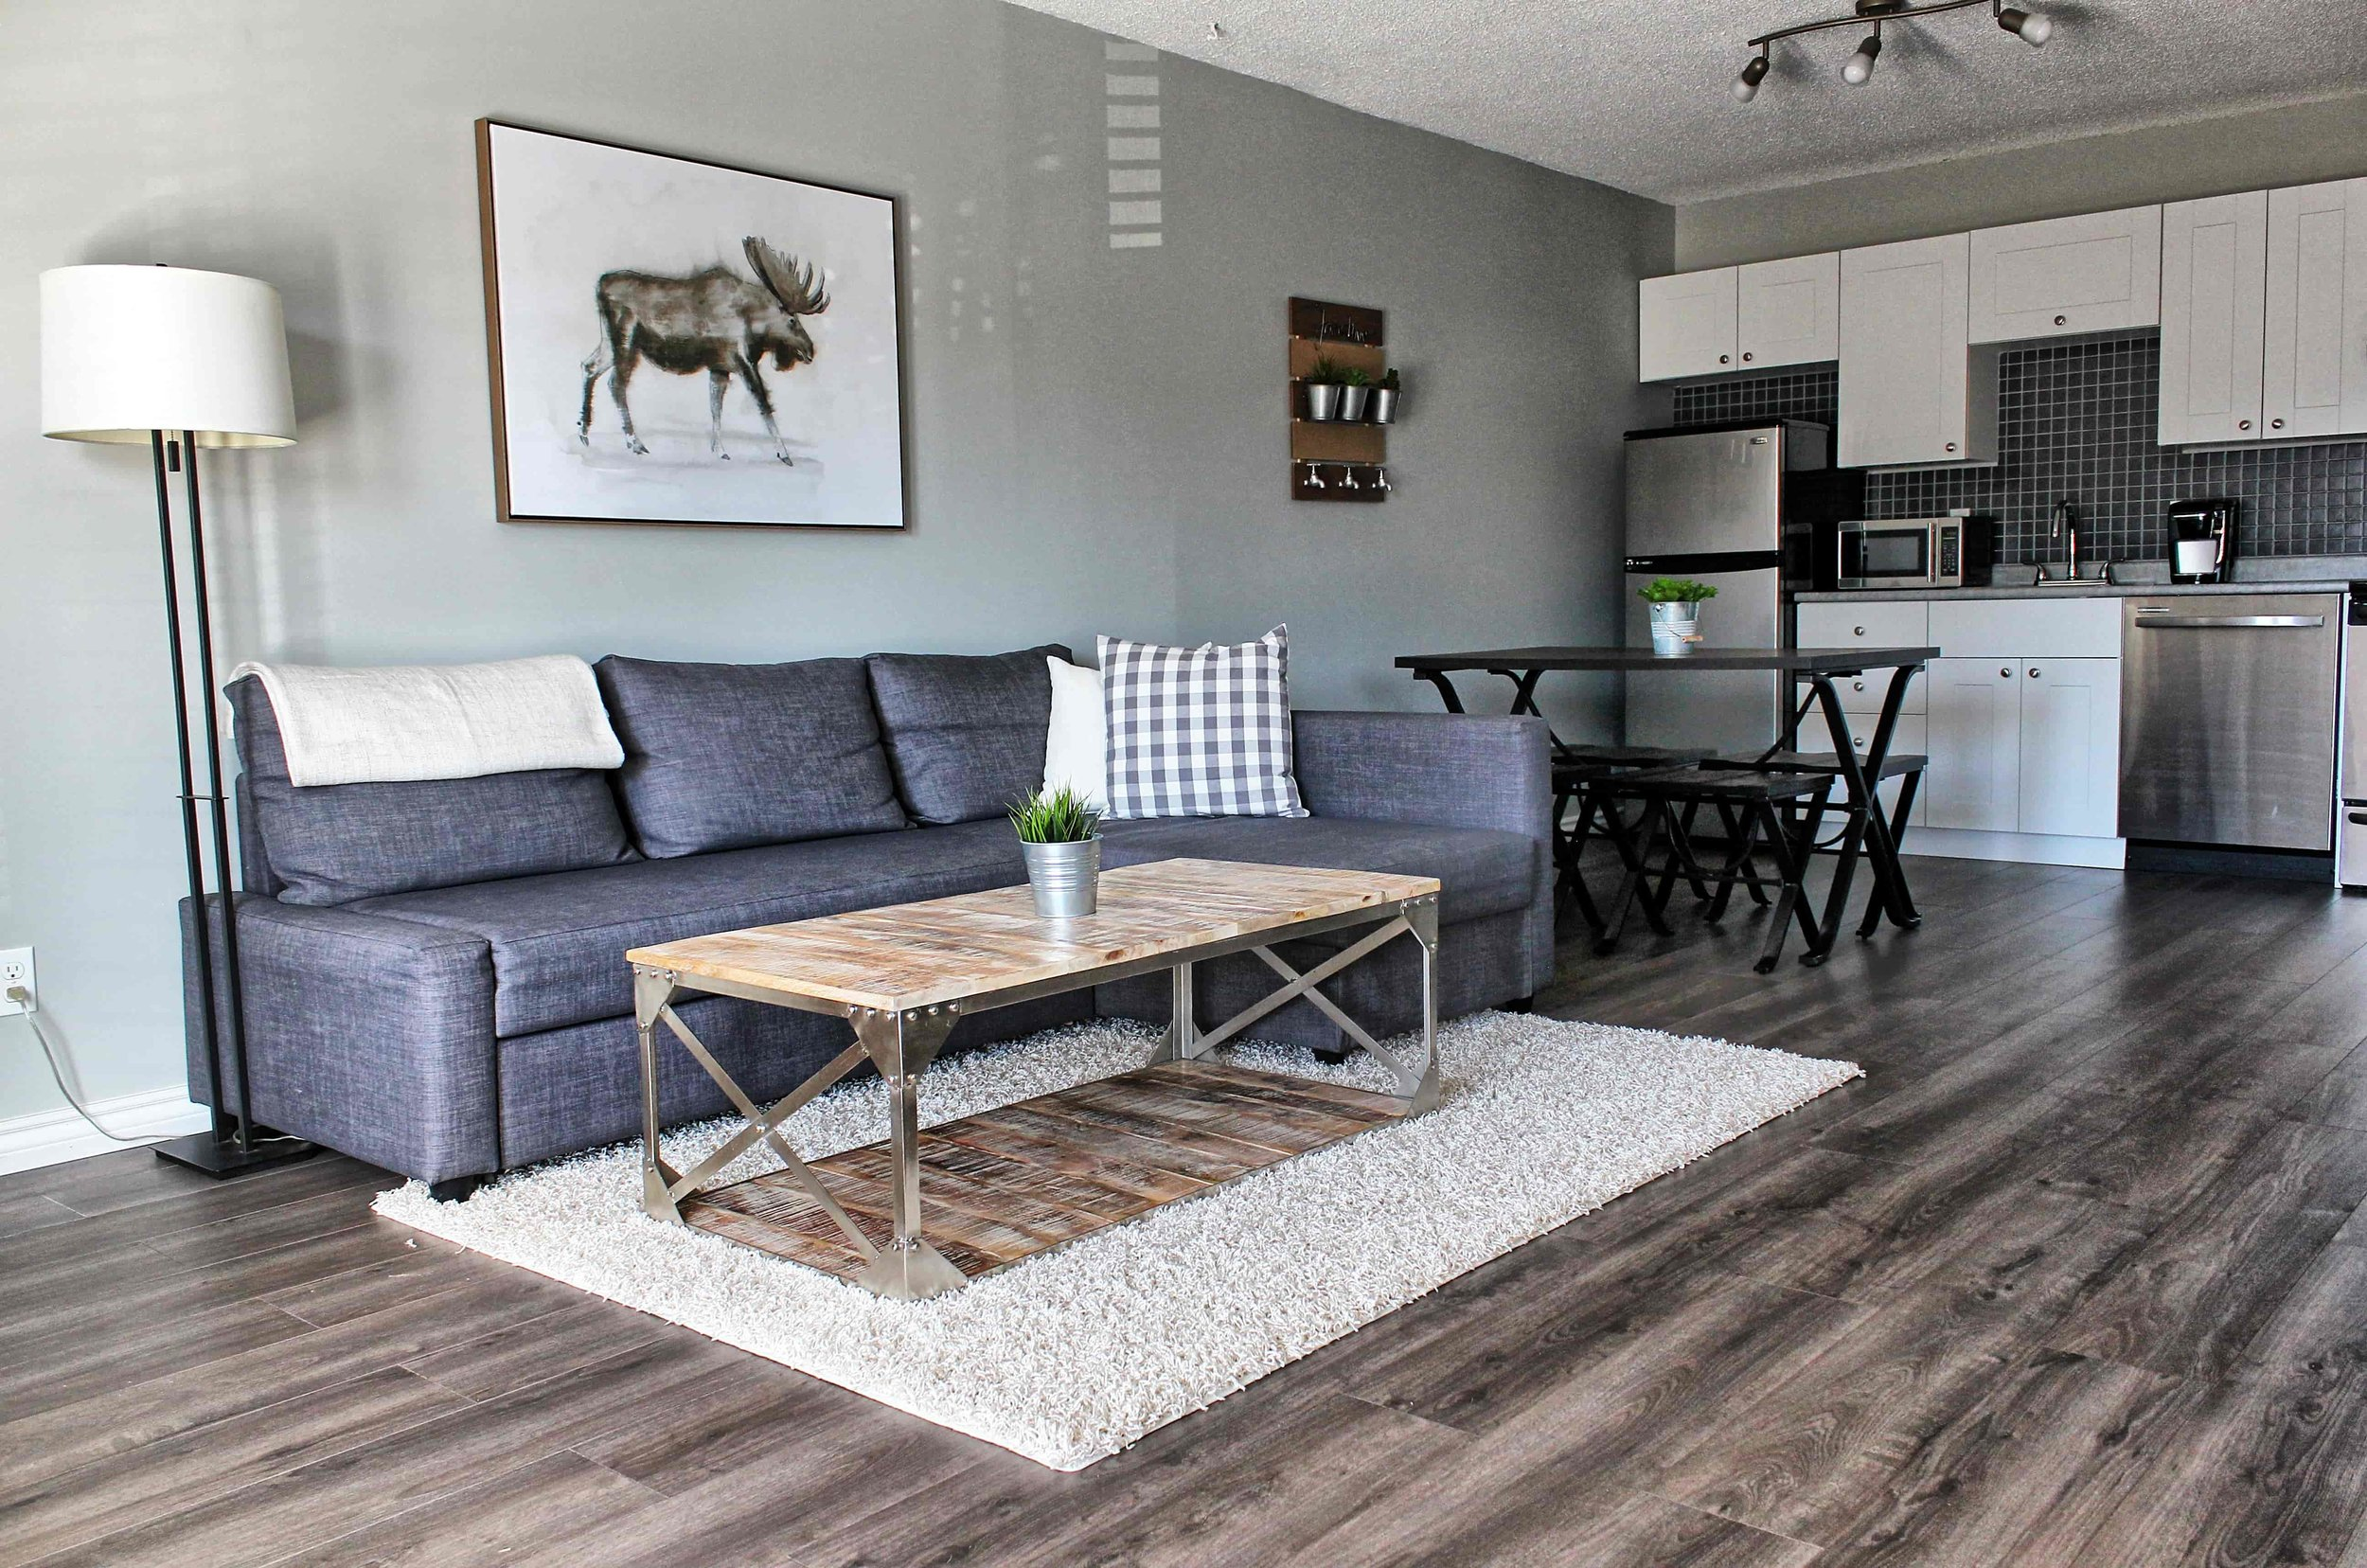 1_Moose_Lodge_Livingroom-min.jpg